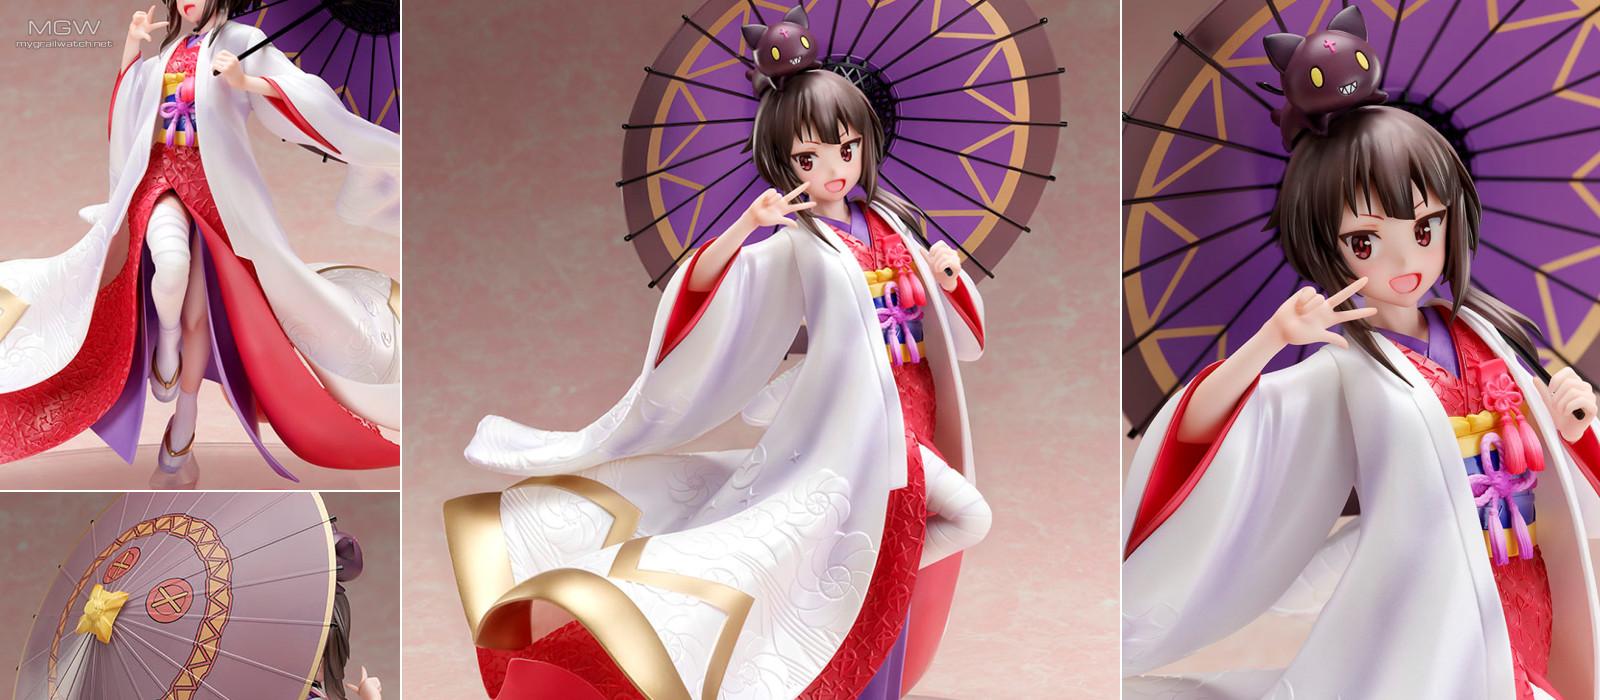 Megumin White Kimono by FuRyu from KonoSuba